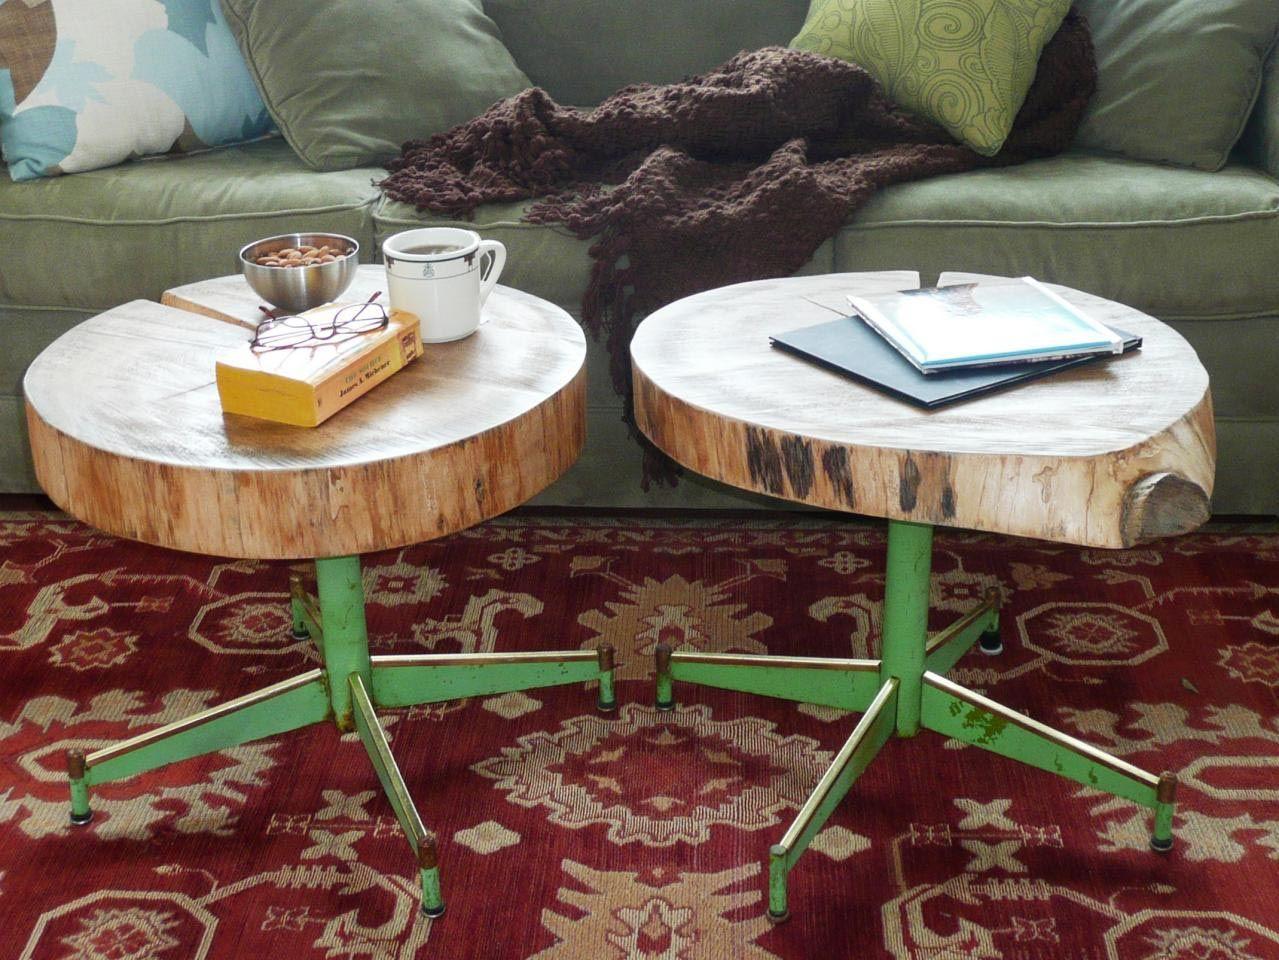 Log coffee table kits coffee tables pinterest log coffee log coffee table kits solutioingenieria Choice Image